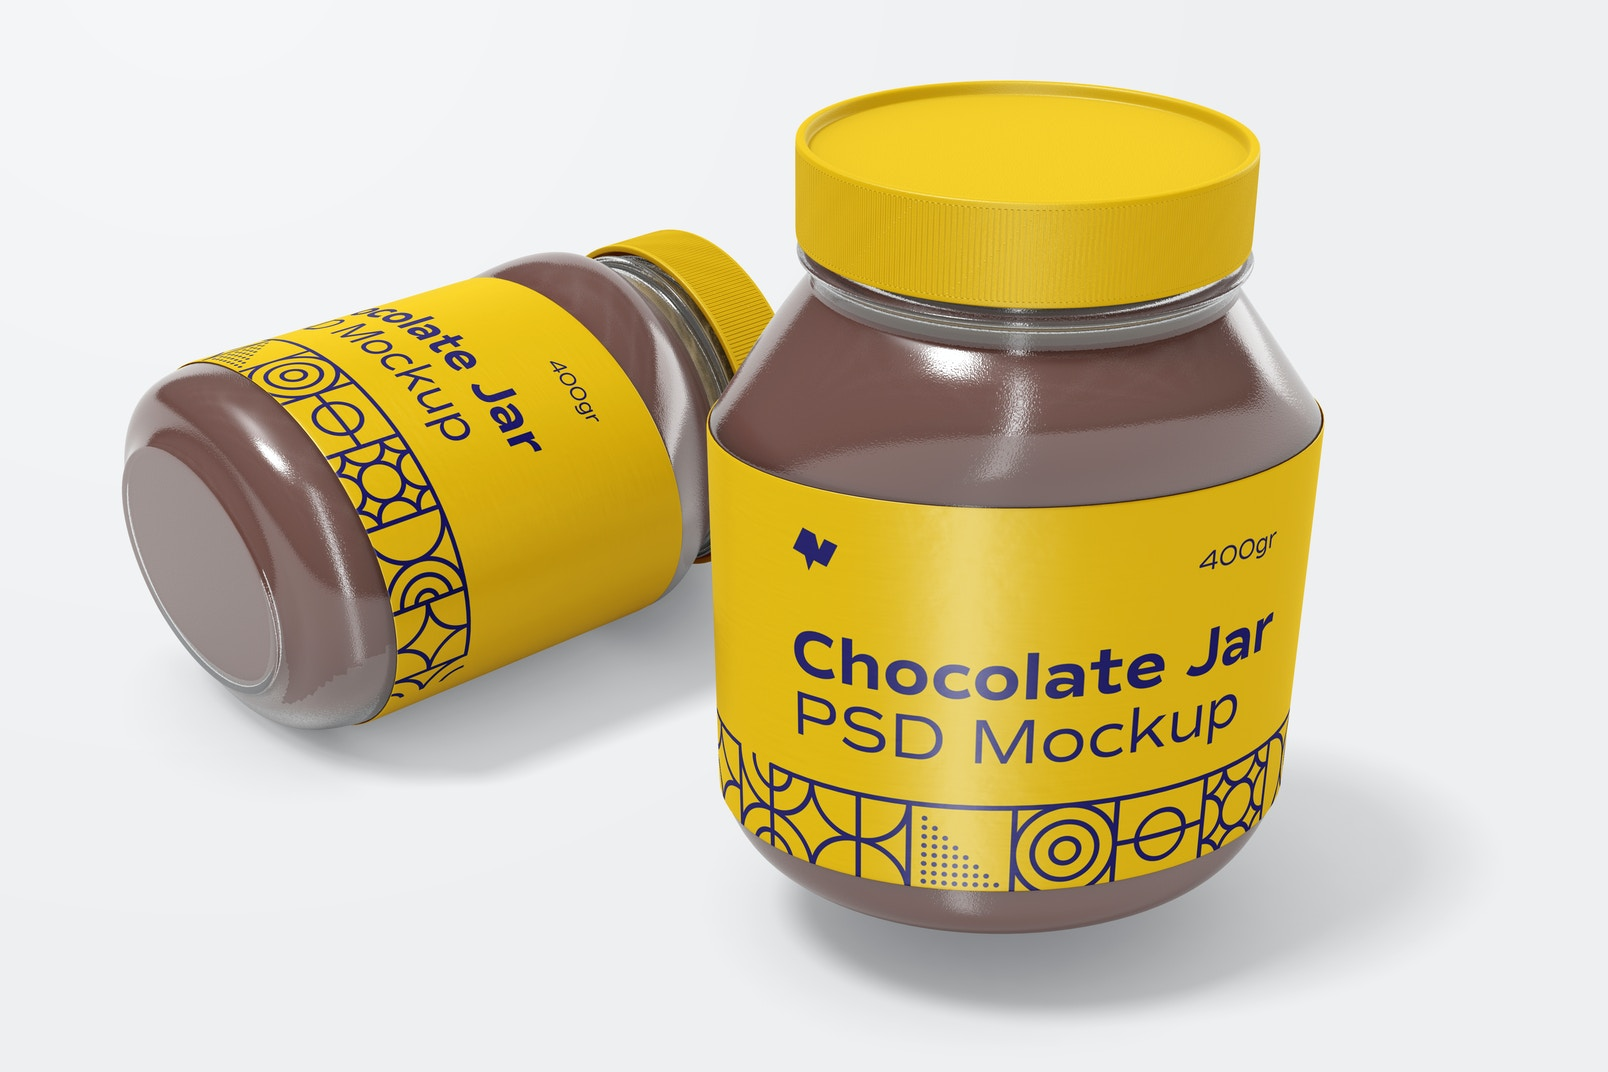 Chocolate Spread Jars Mockup, Dropped